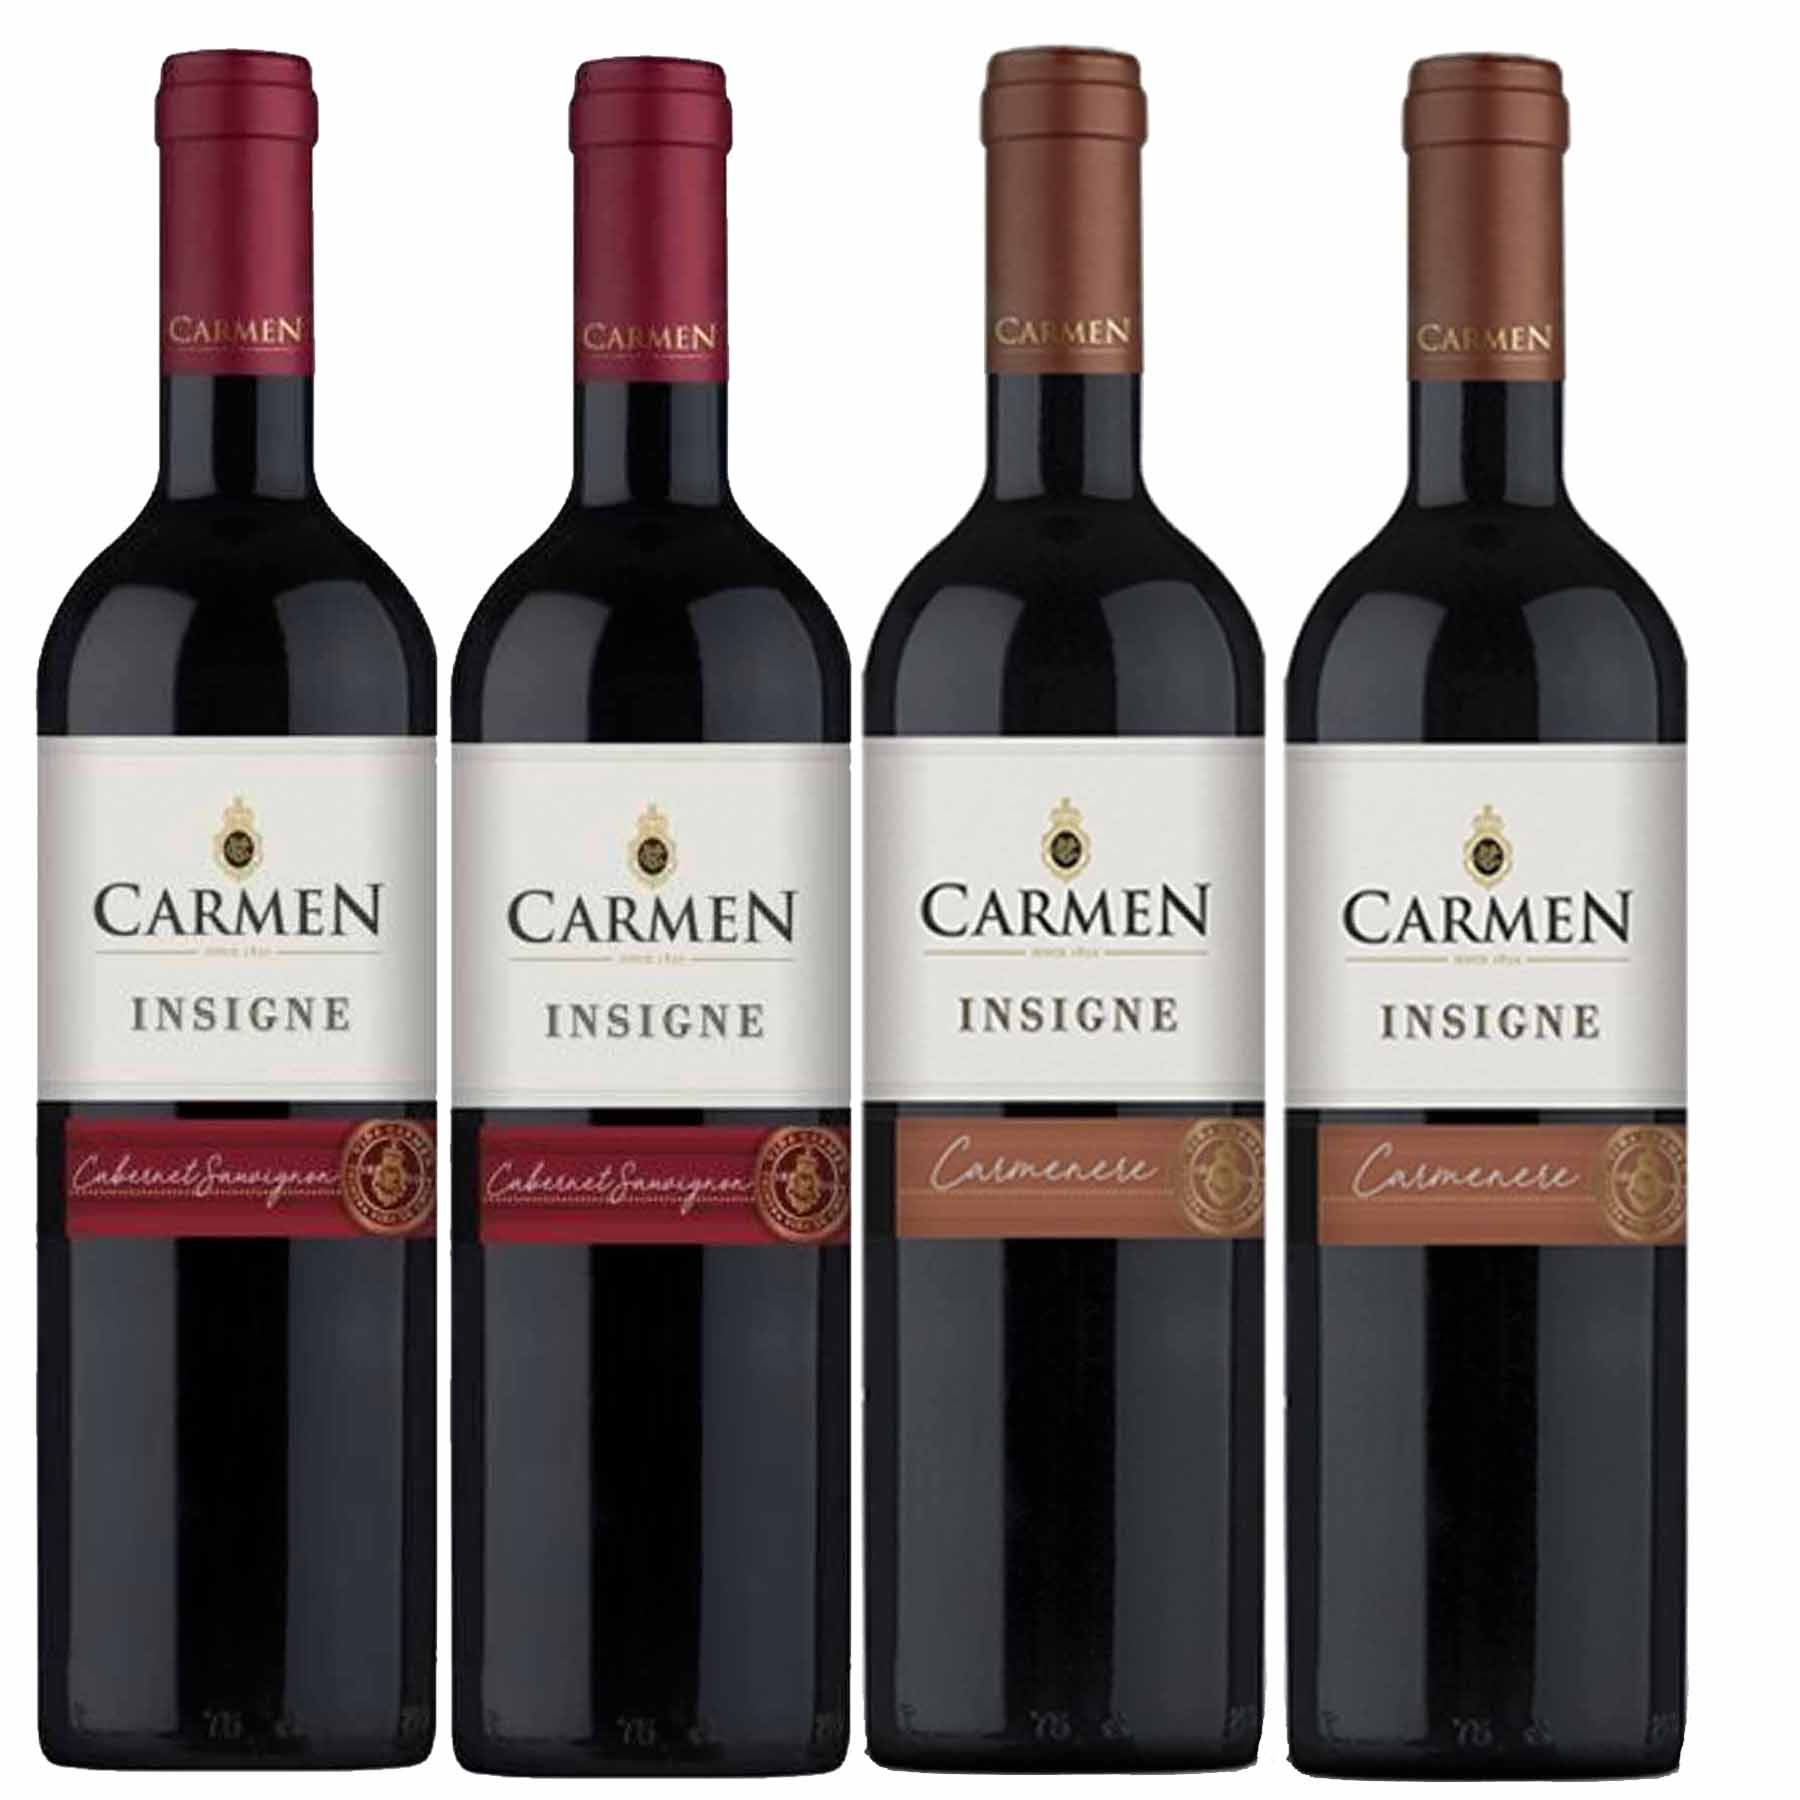 Kit 4 Vinhos Chilenos Carmen Insigne Cabernet Sauvignon e Carmenere